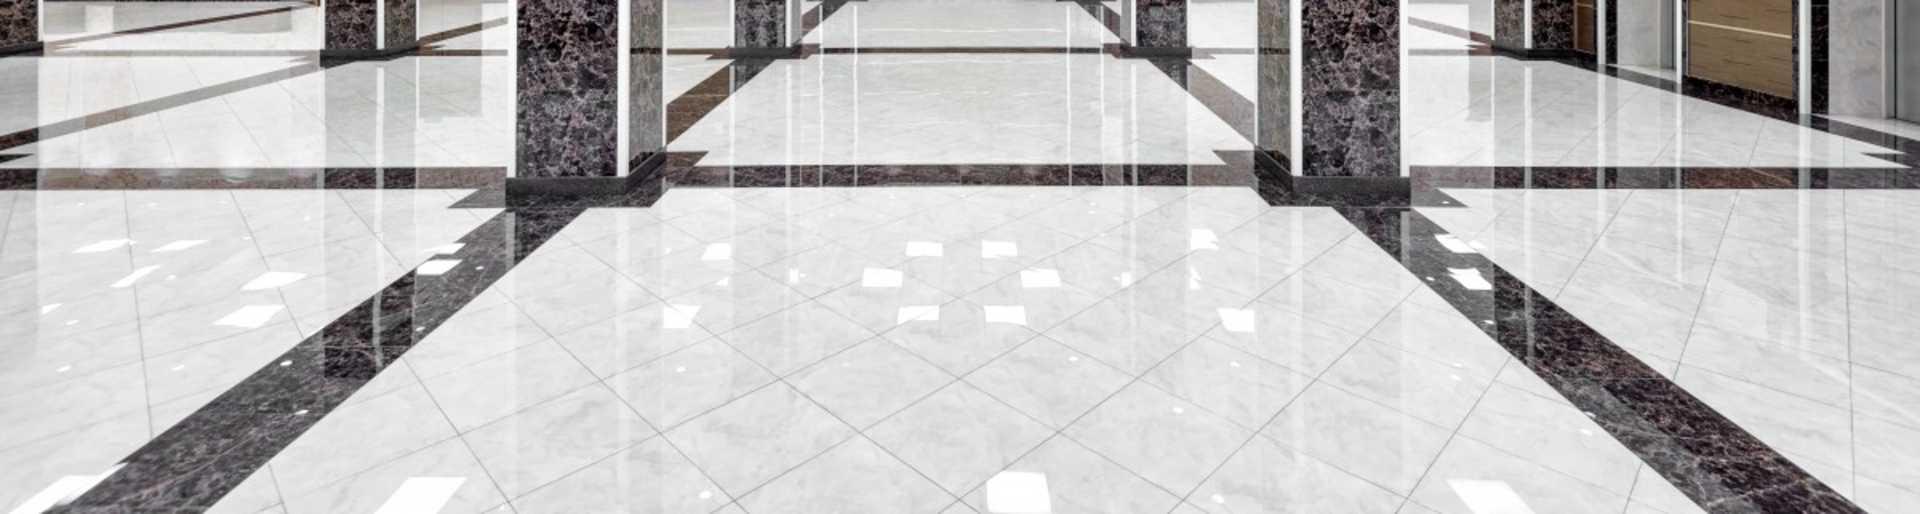 Glossy polyaspartic epoxy flooring from Ohio Garage Interiors